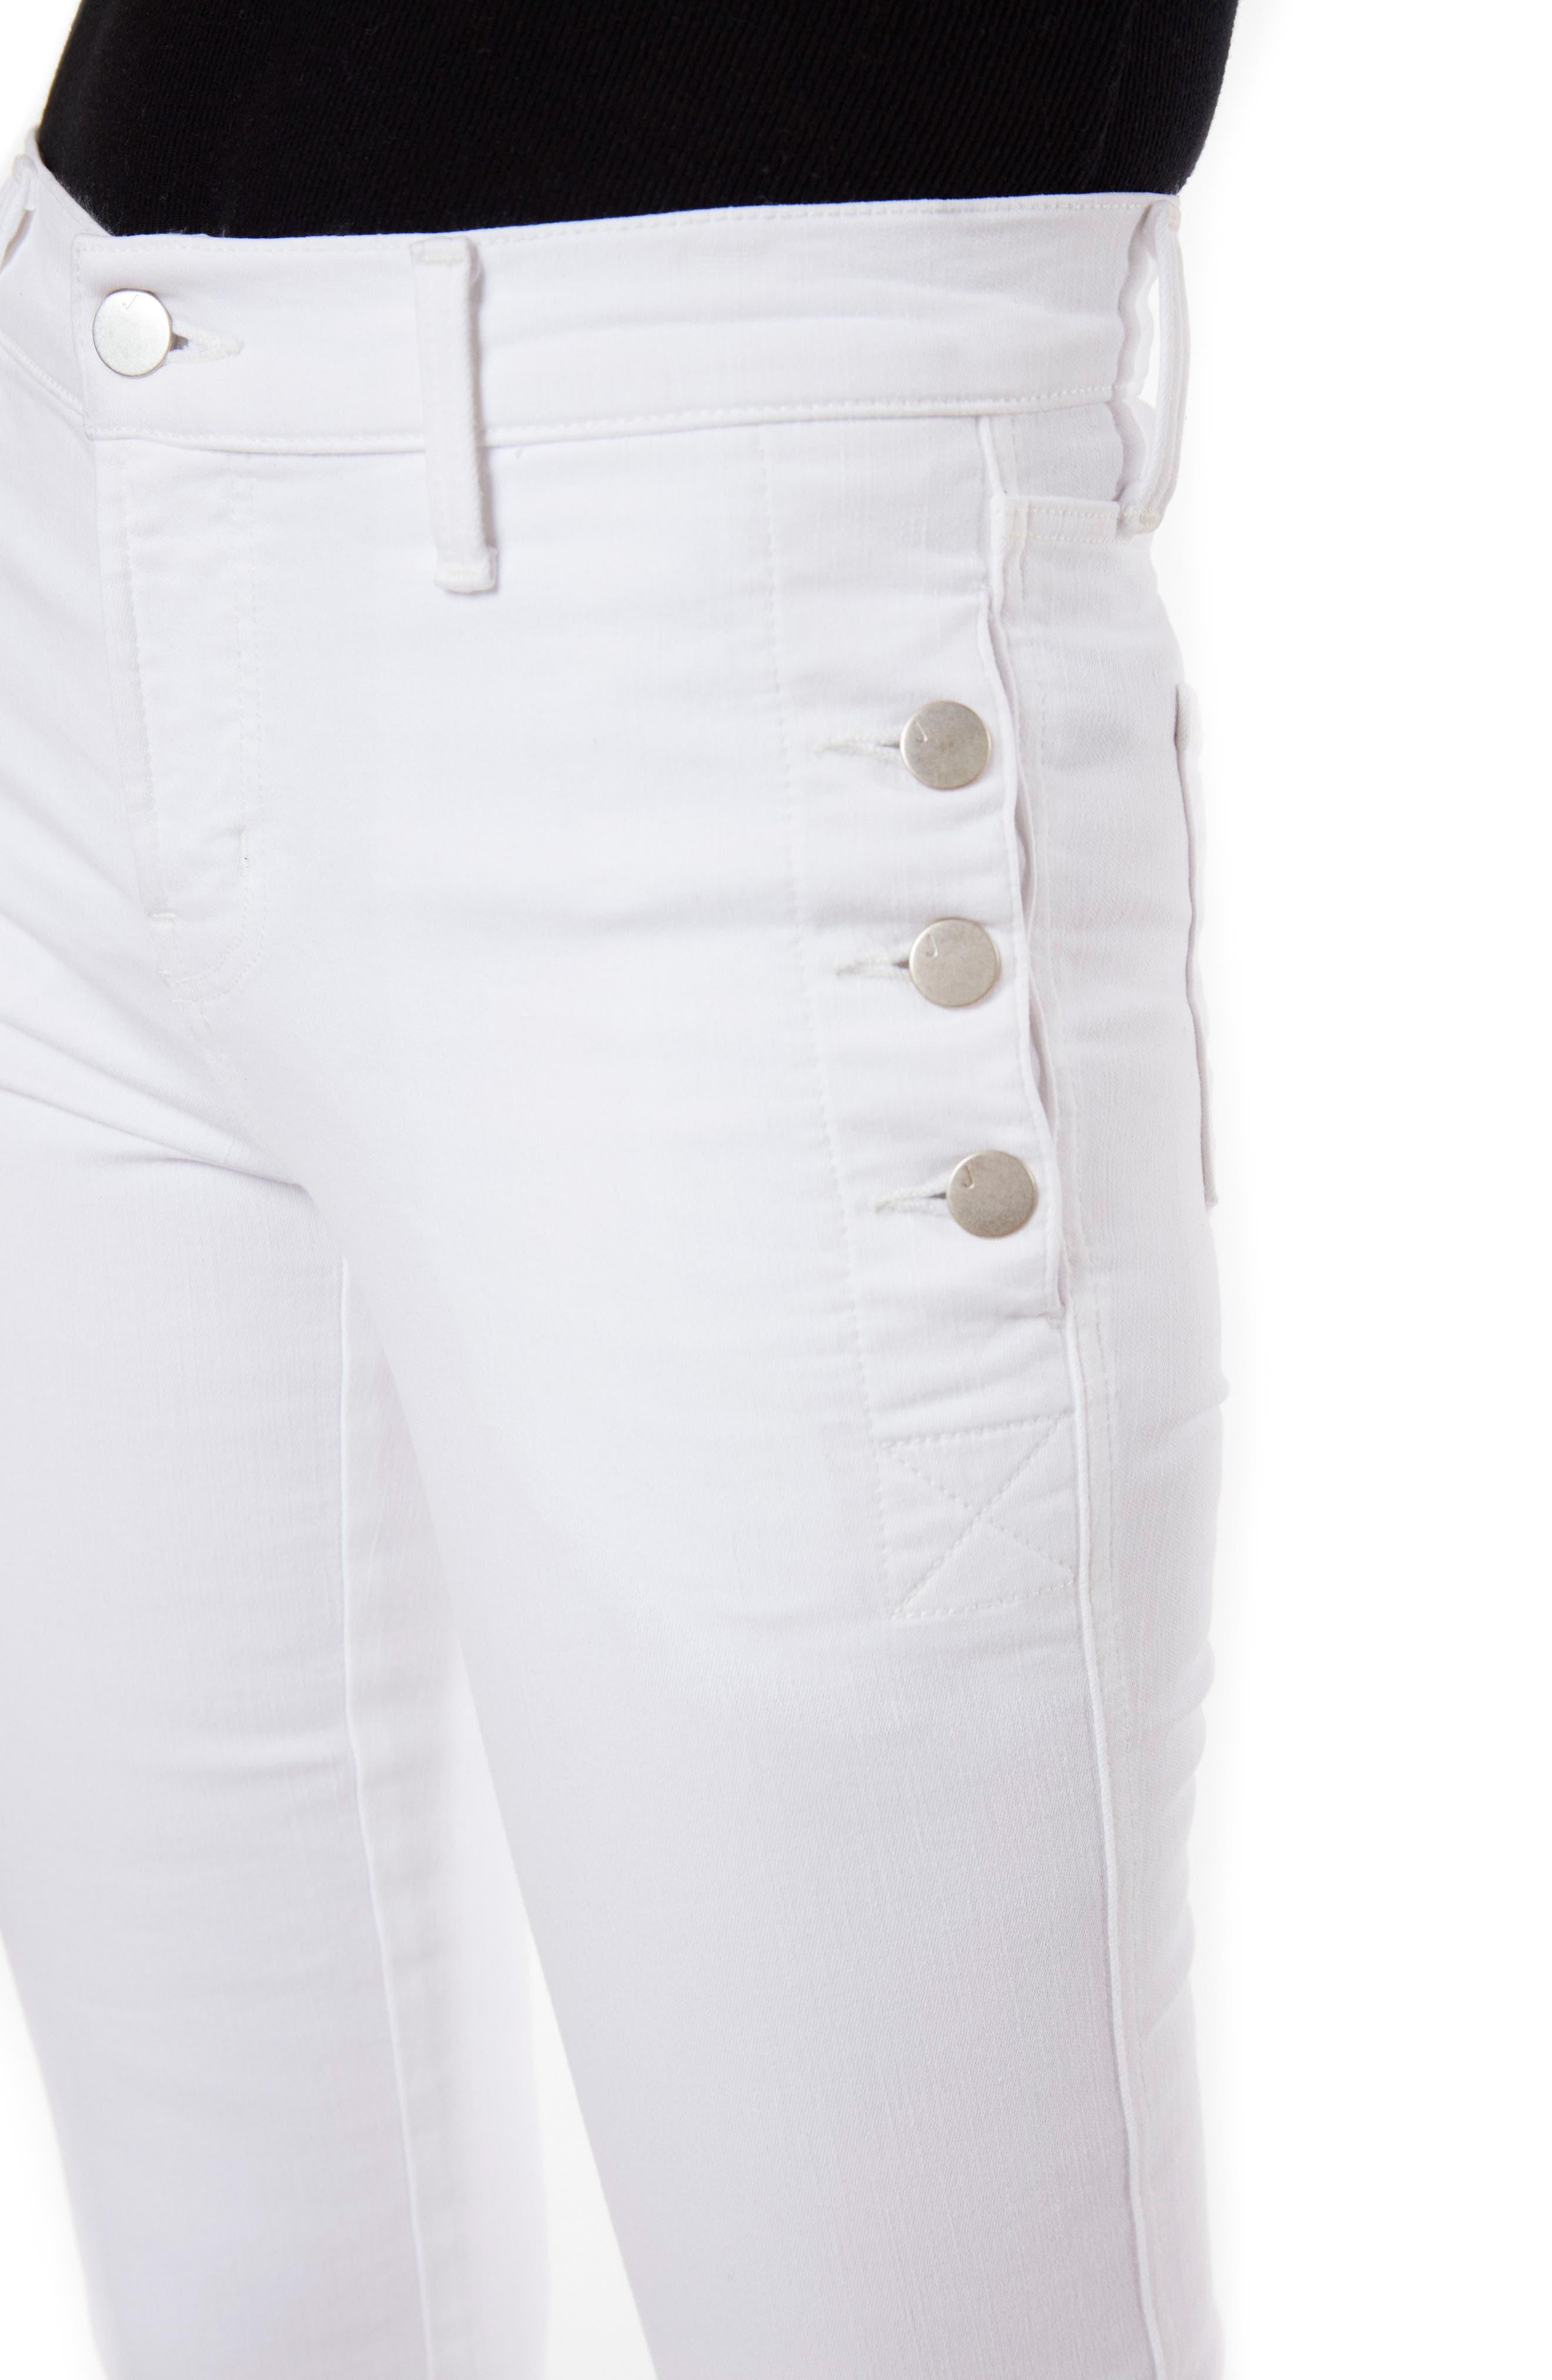 Zion Crop Flare Jeans,                             Alternate thumbnail 4, color,                             161